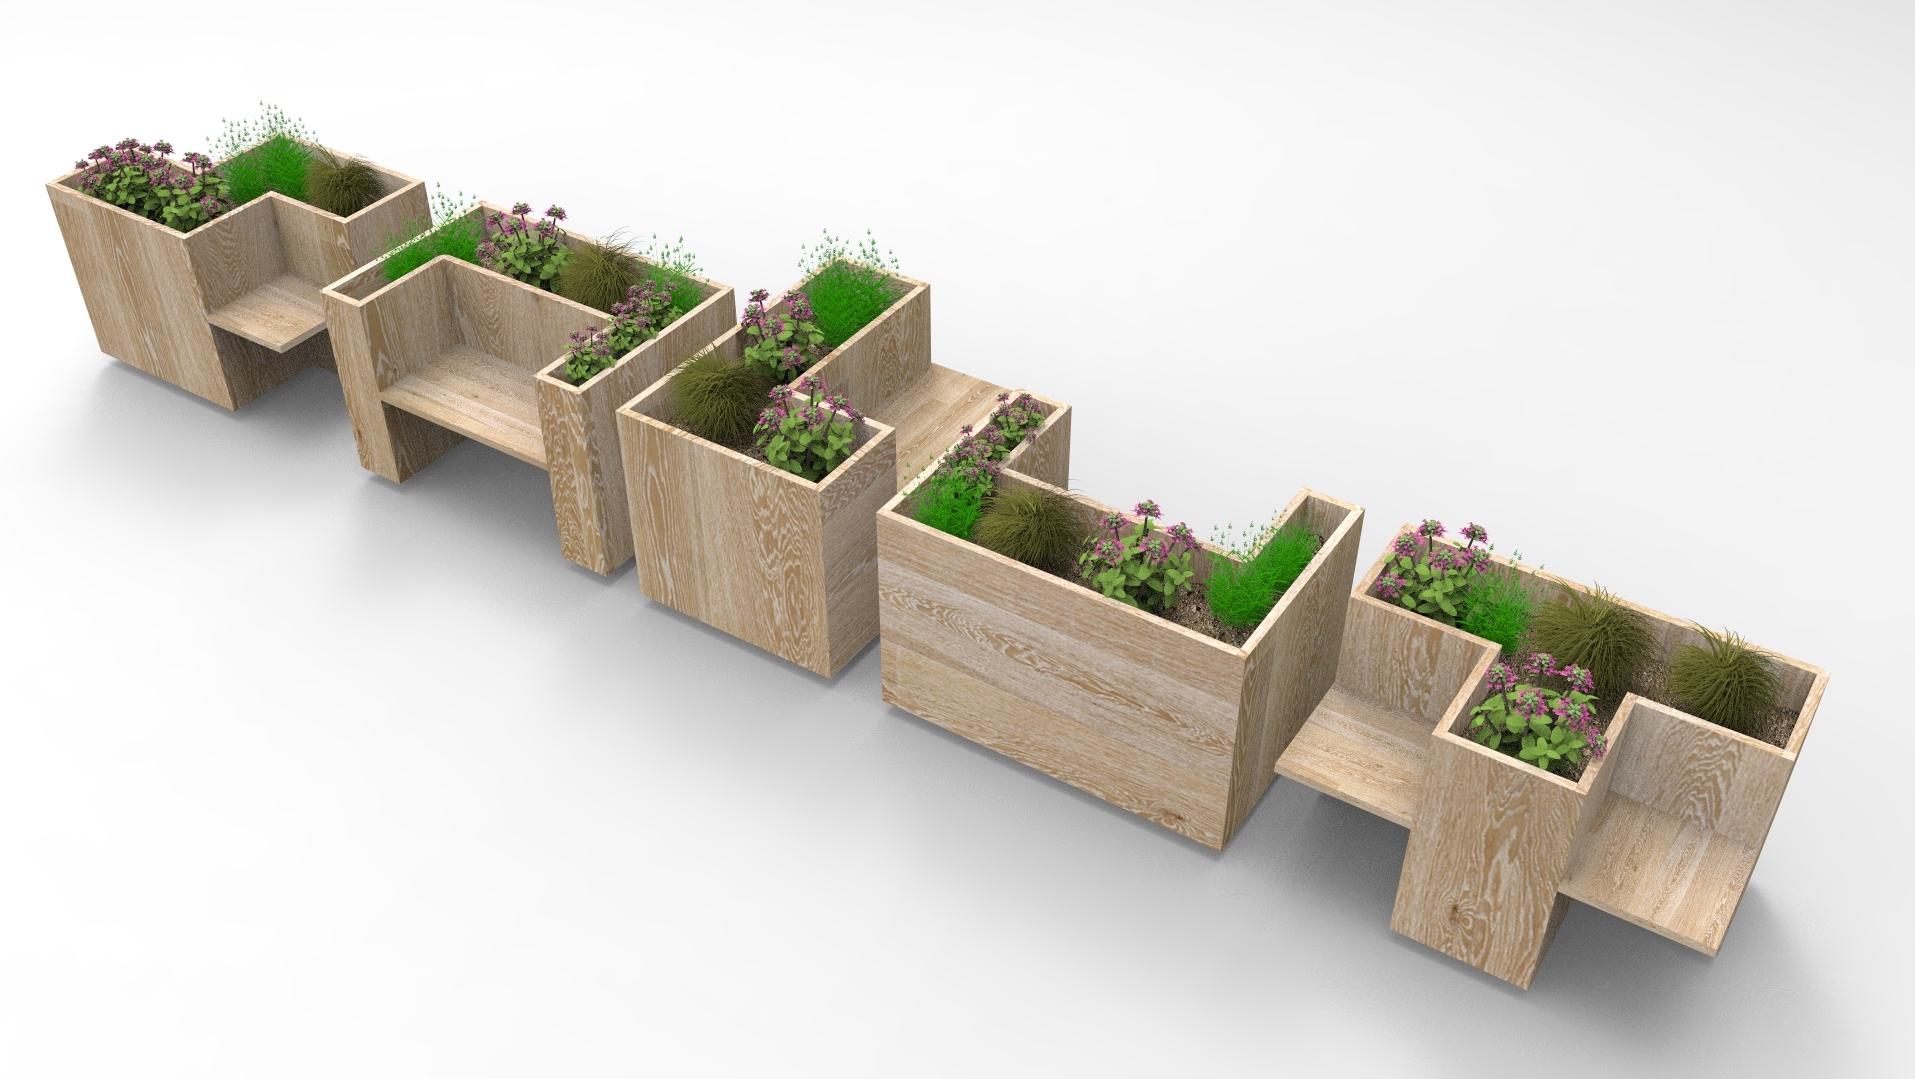 Creation of modular outdoor furniture